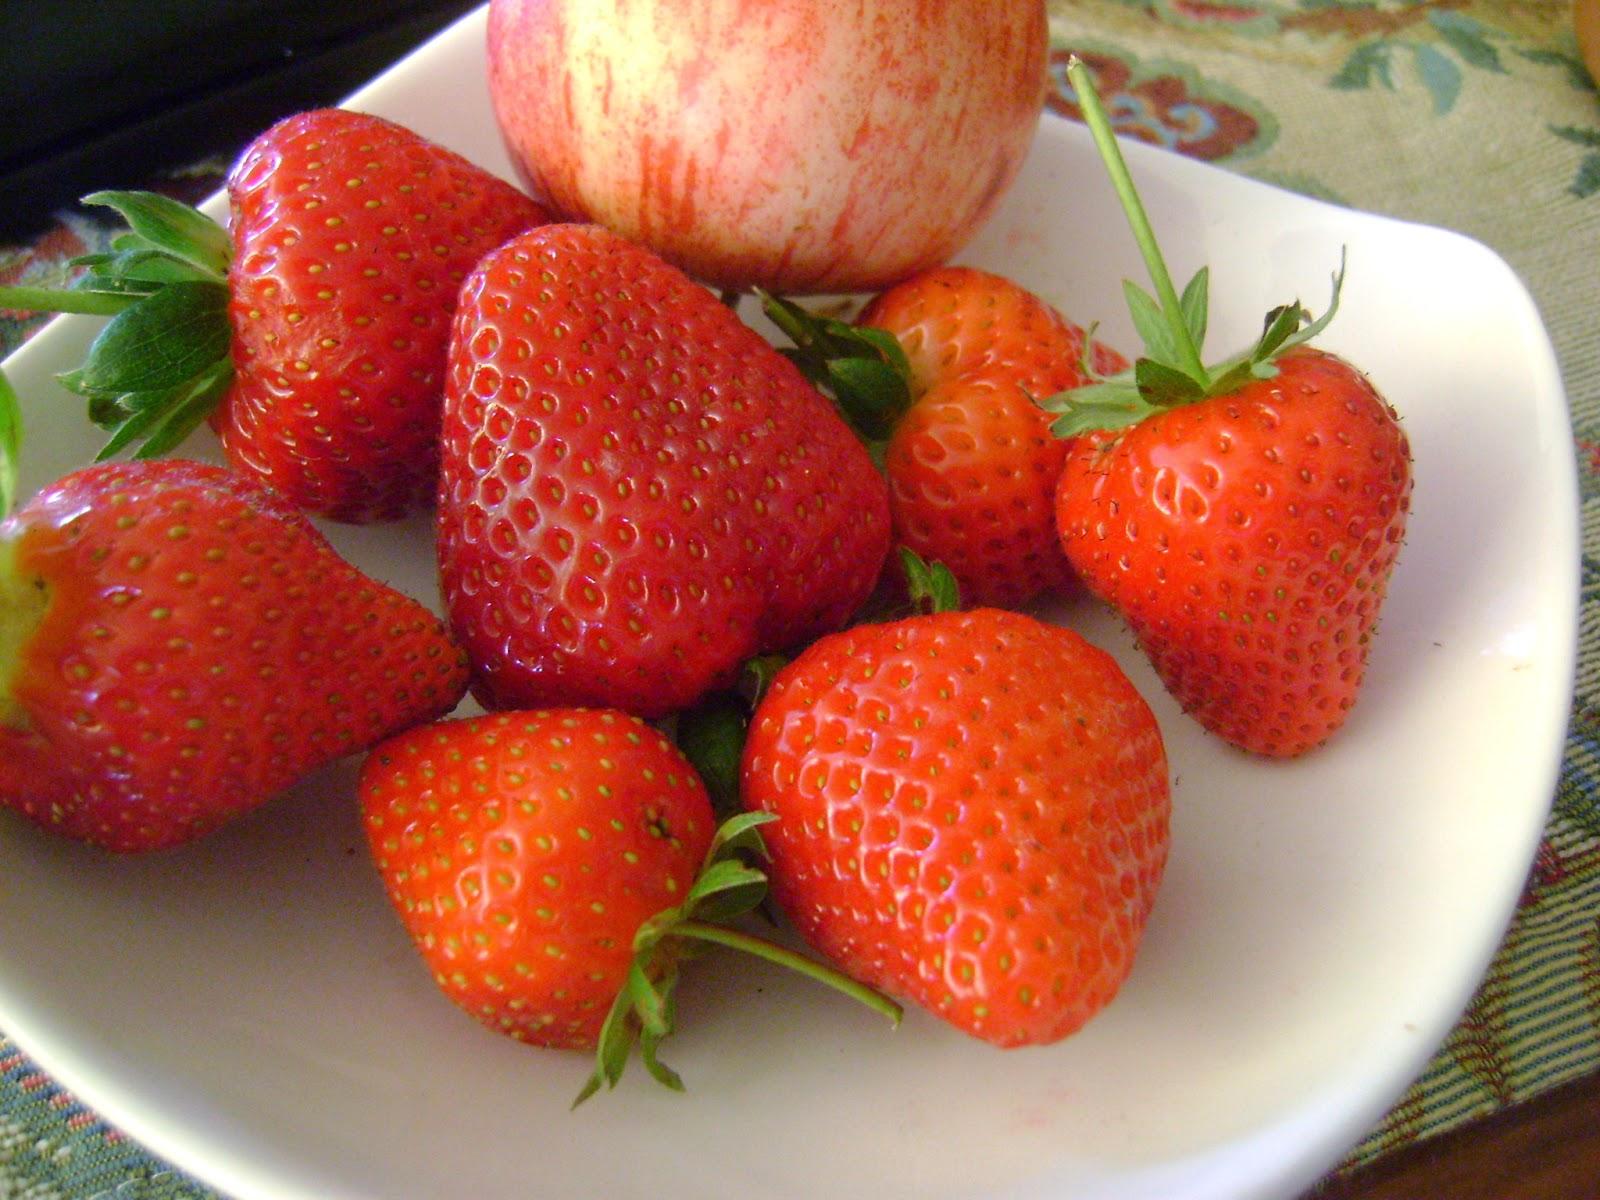 fruit strawberries 4 - photo #45